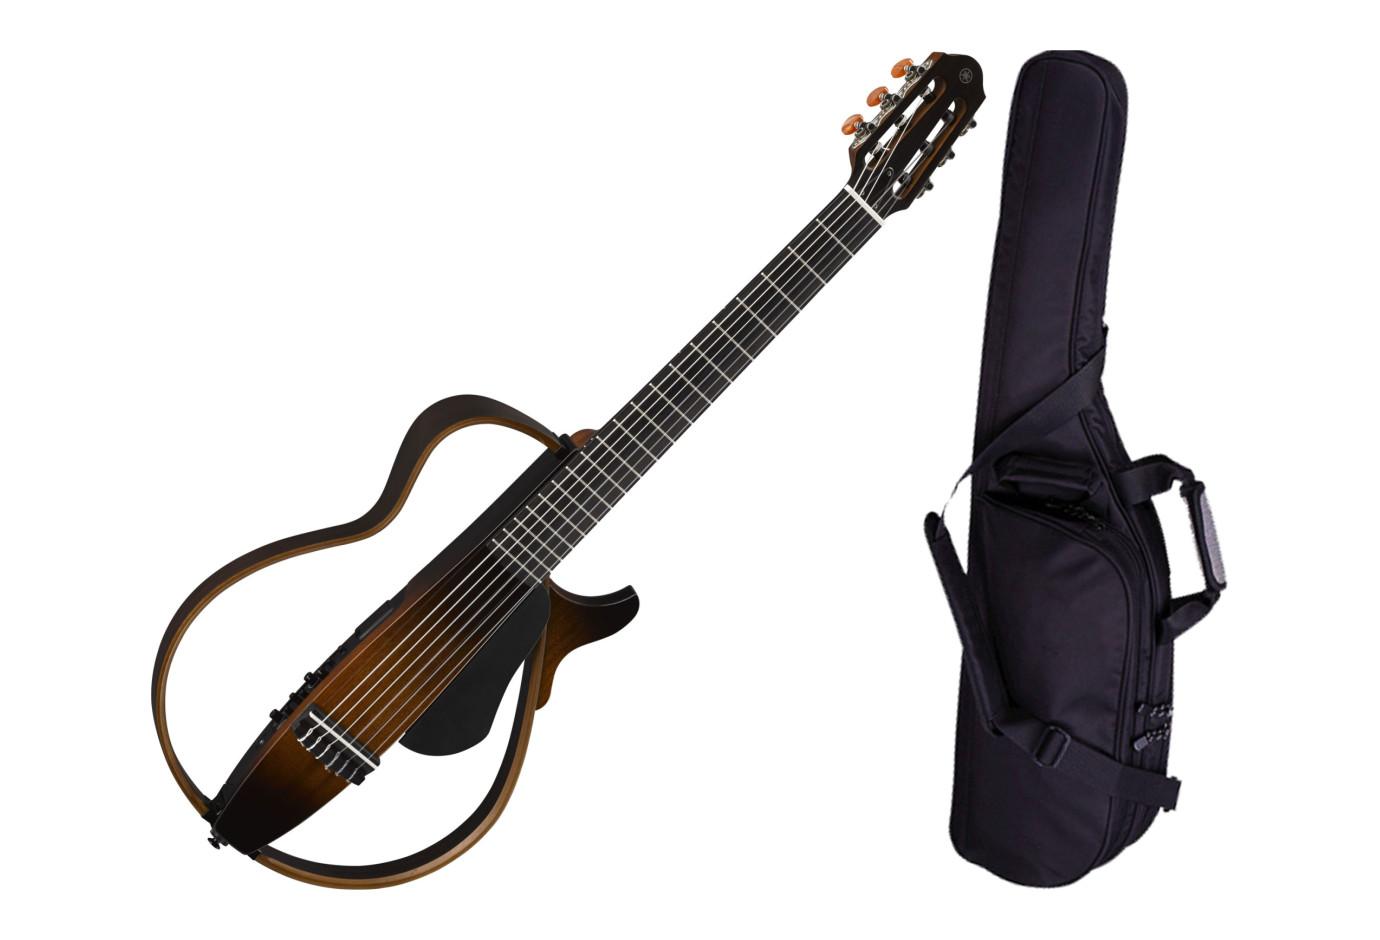 yamaha slg200n tbs nylon string silent guitar w bag. Black Bedroom Furniture Sets. Home Design Ideas